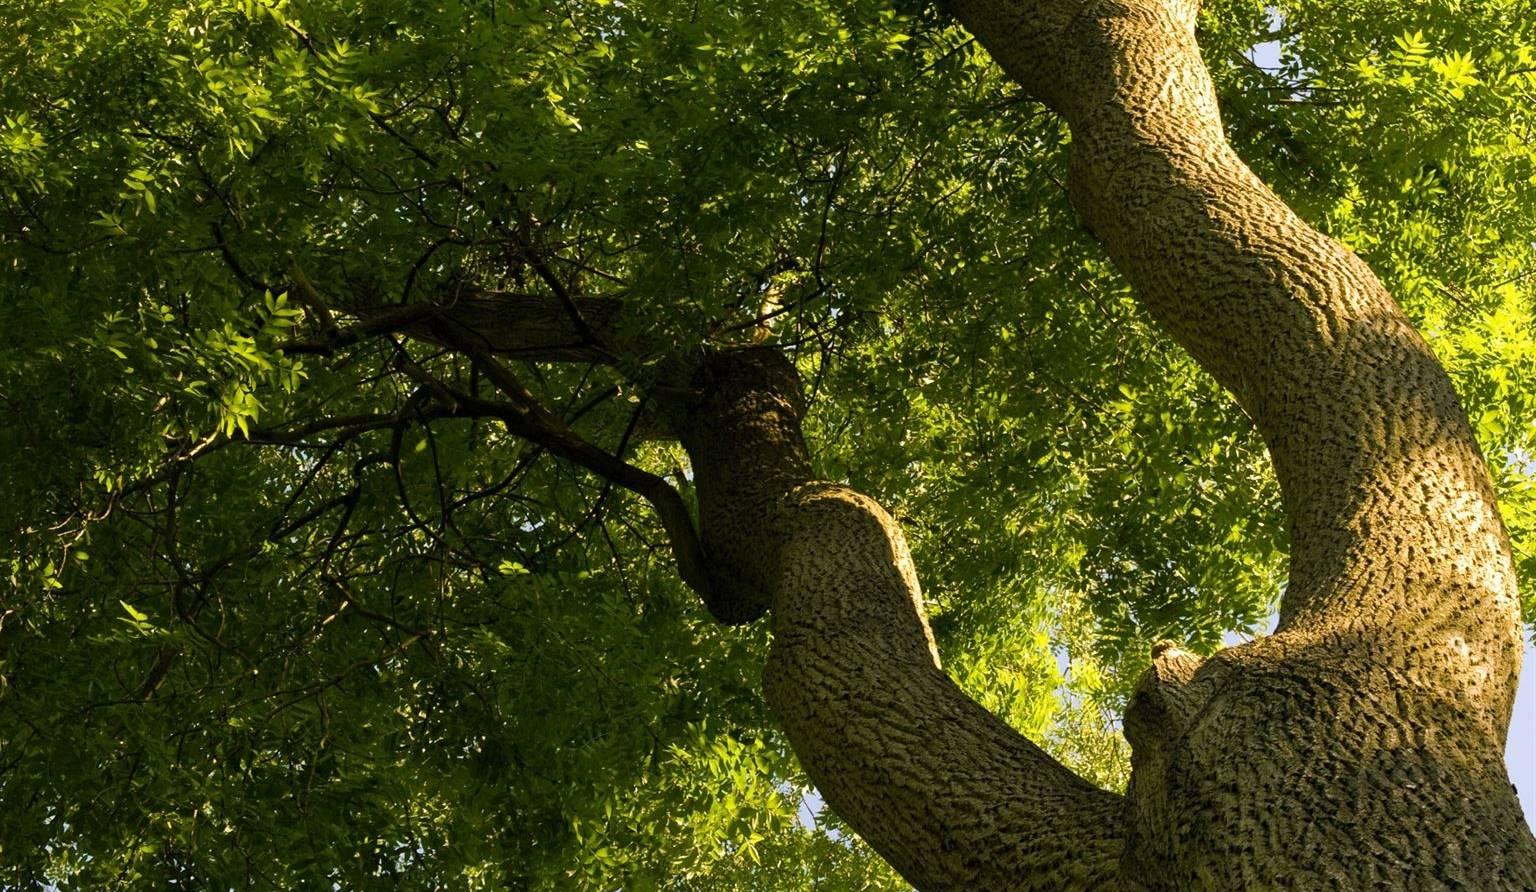 Agrile du frene vos arbres sont-ils infestes